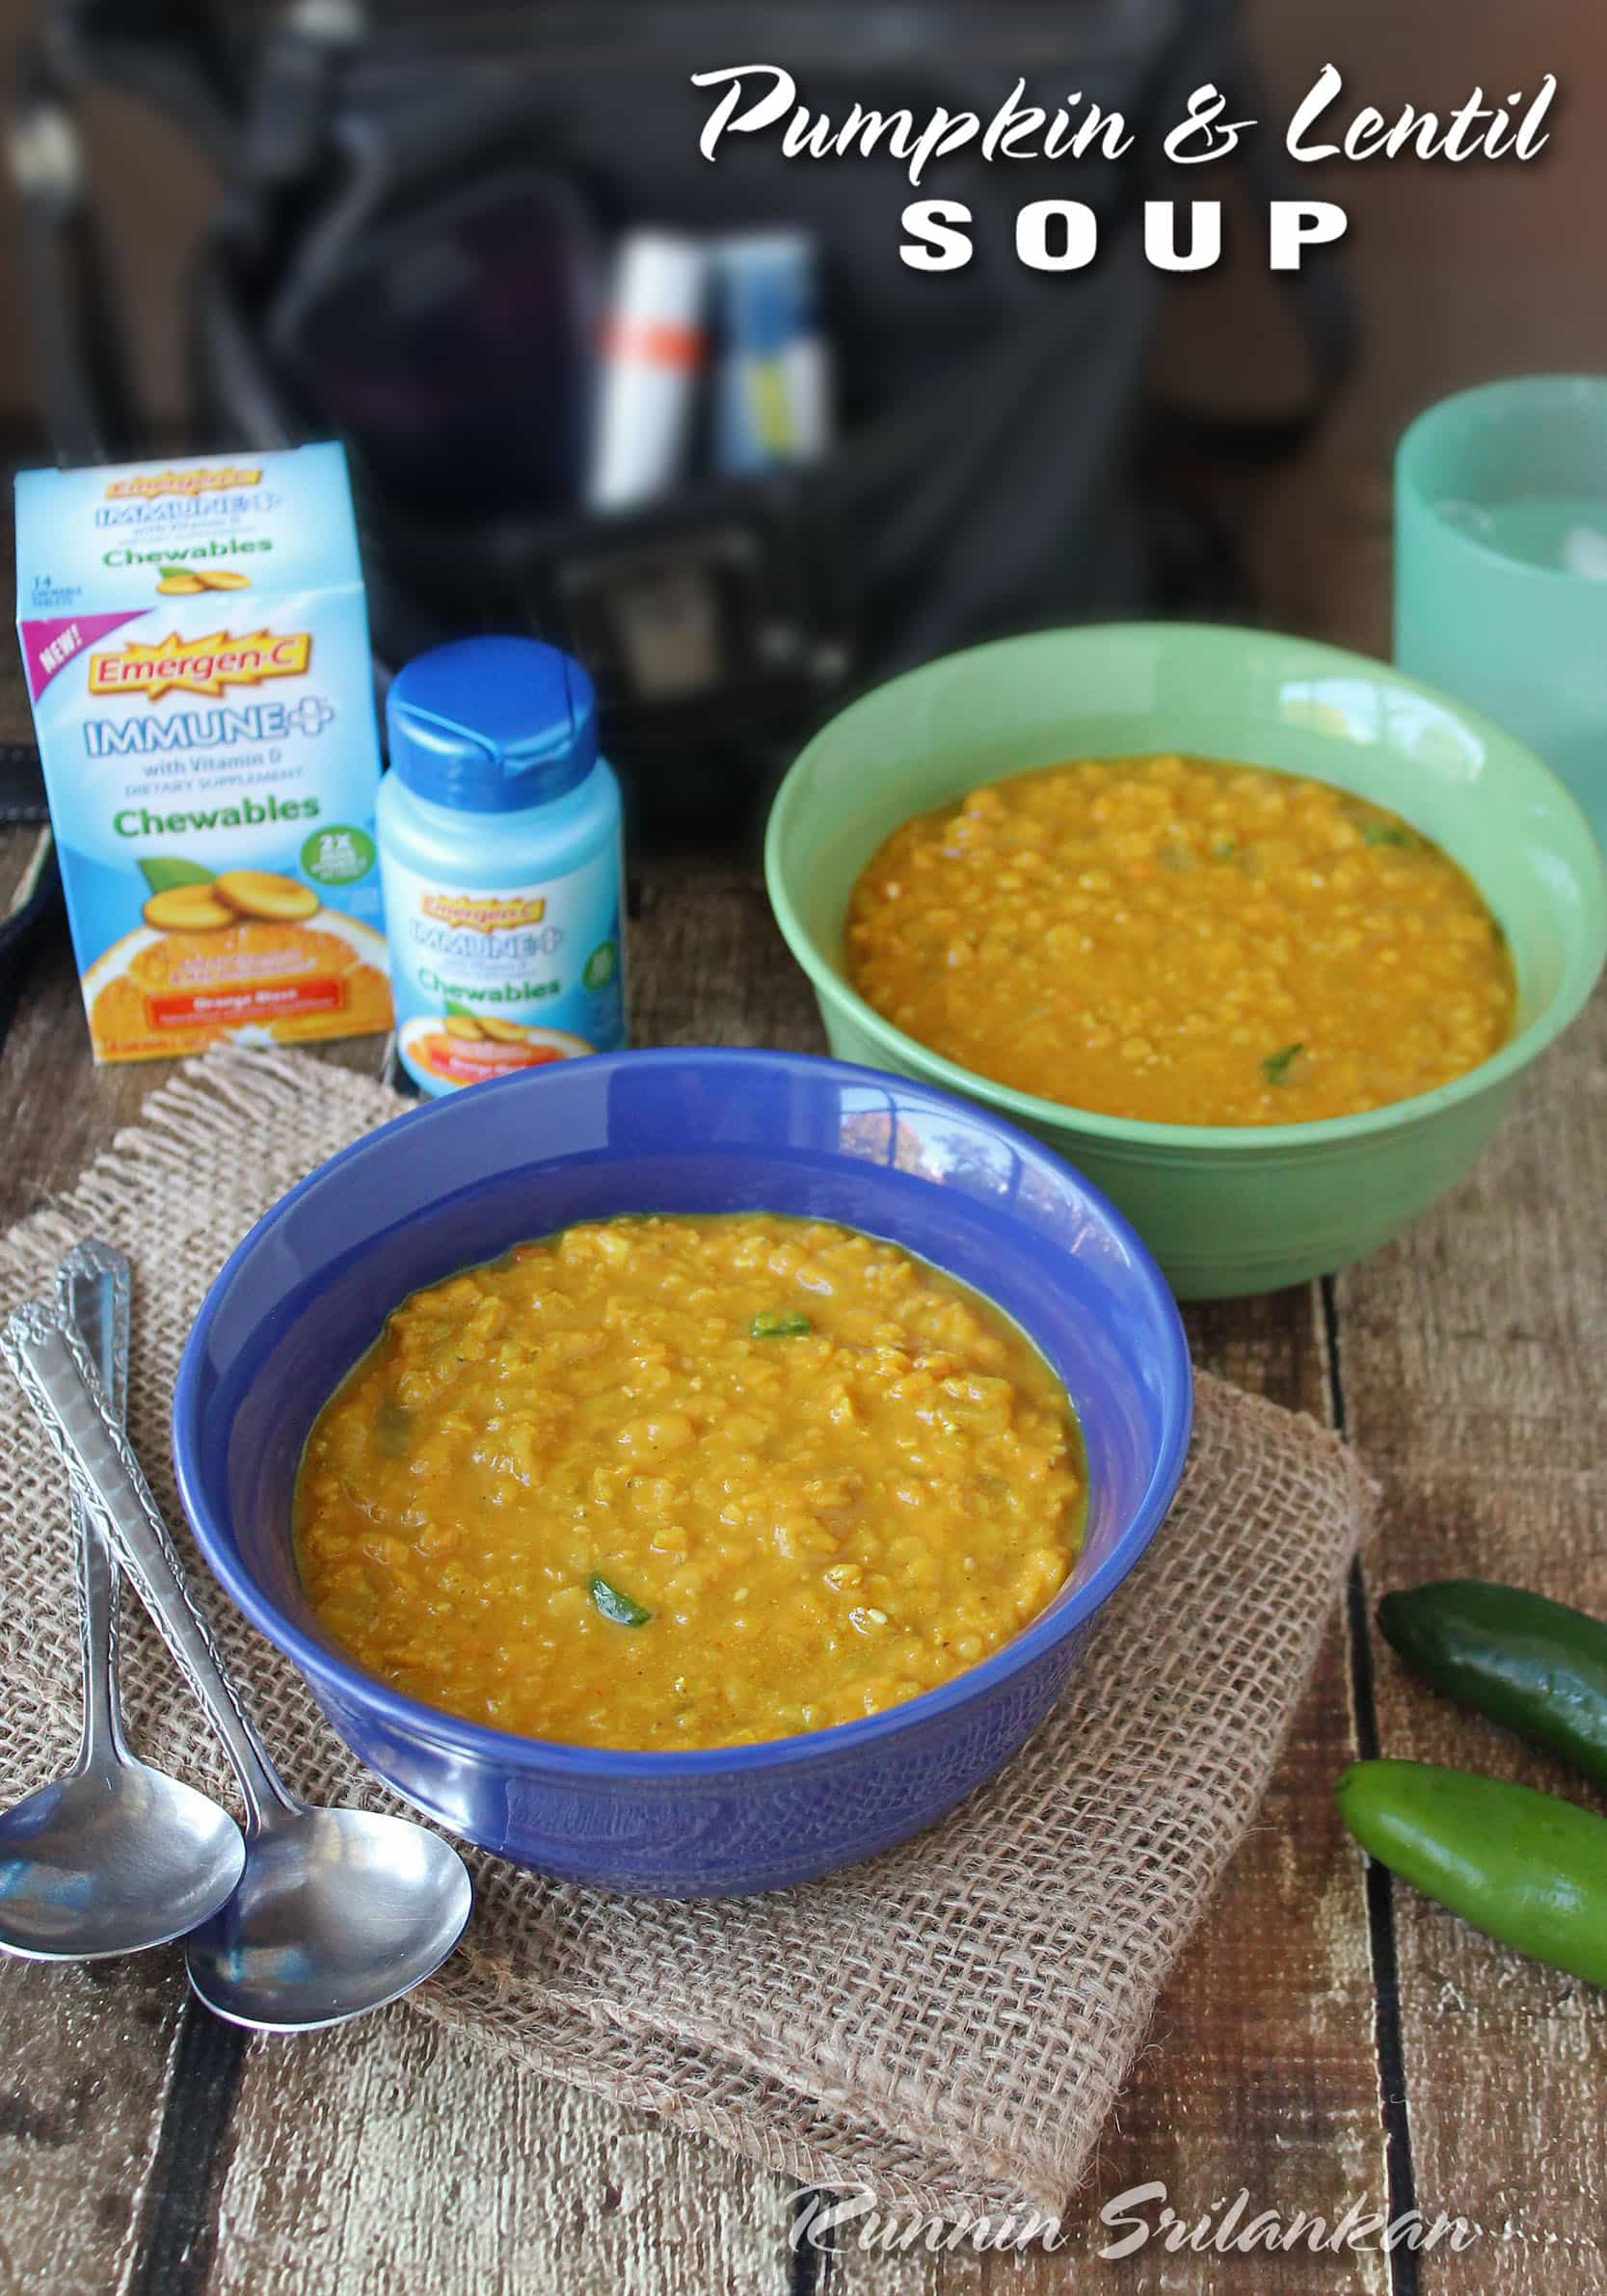 Pumpkin-Lentil-Soup-#BeHealthyForEveryPartOfLife